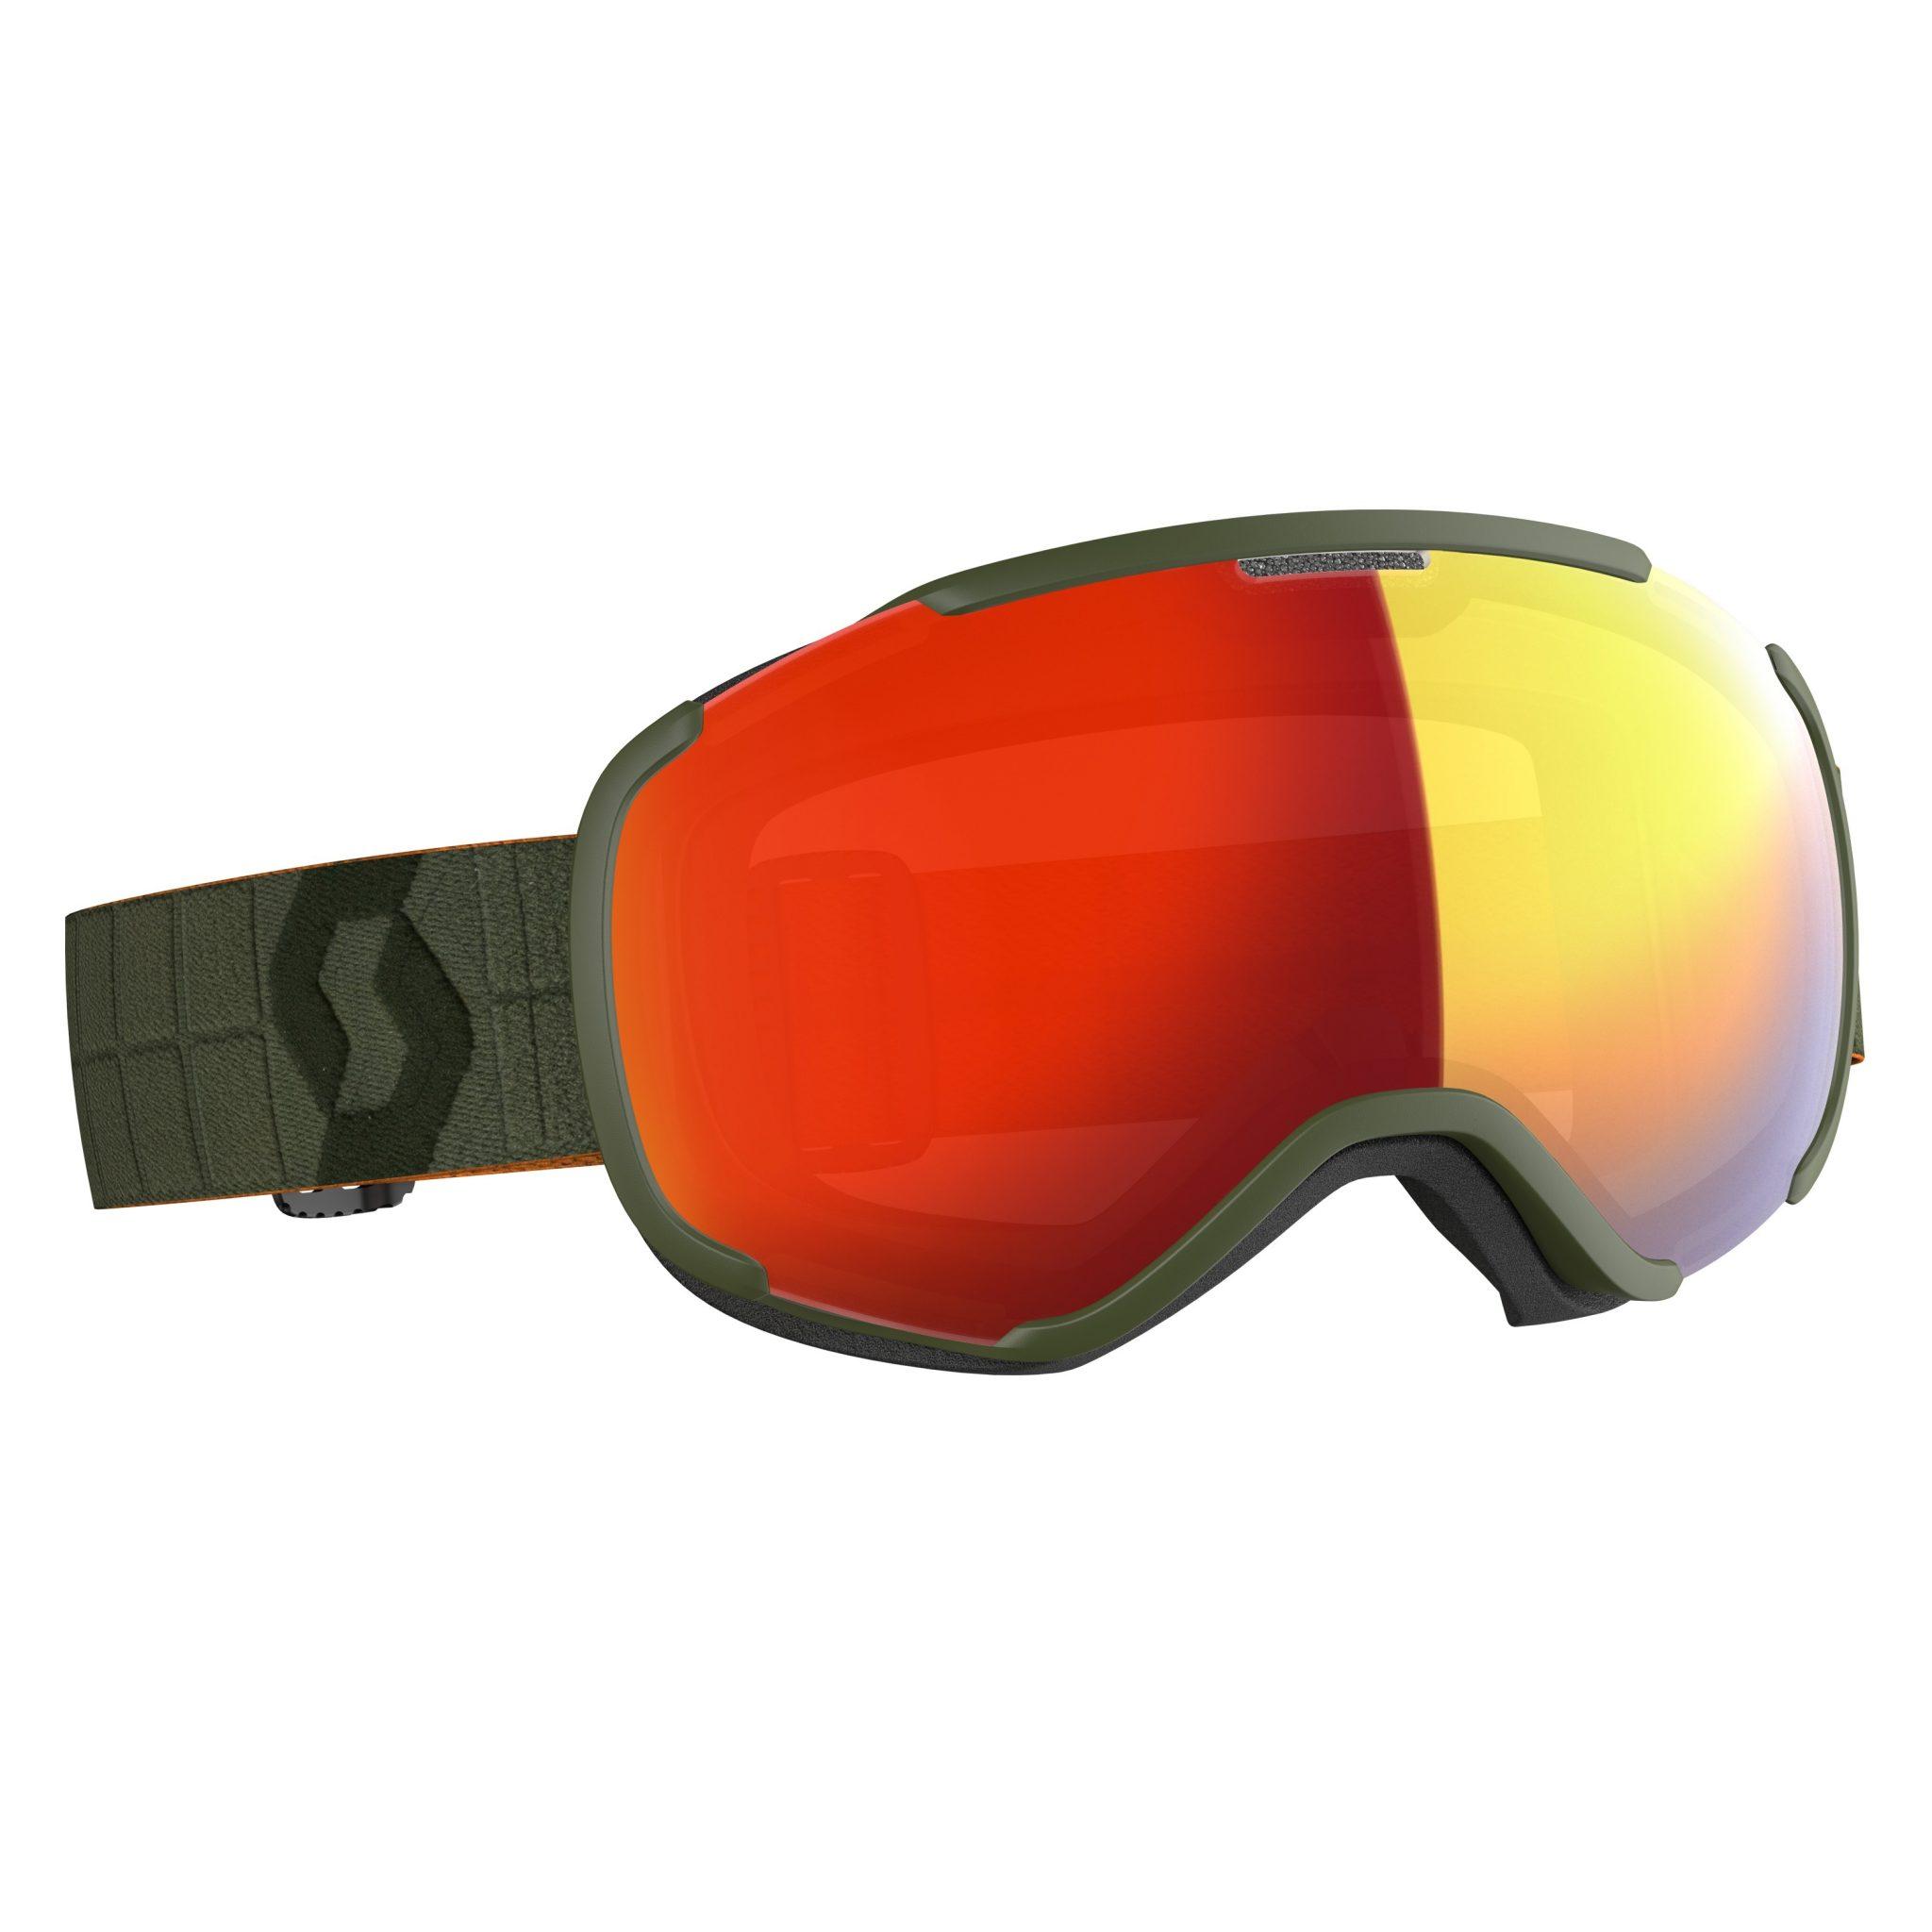 Scott Faze II Goggle - Khaki Green Enhancer Red Chrome - Front View